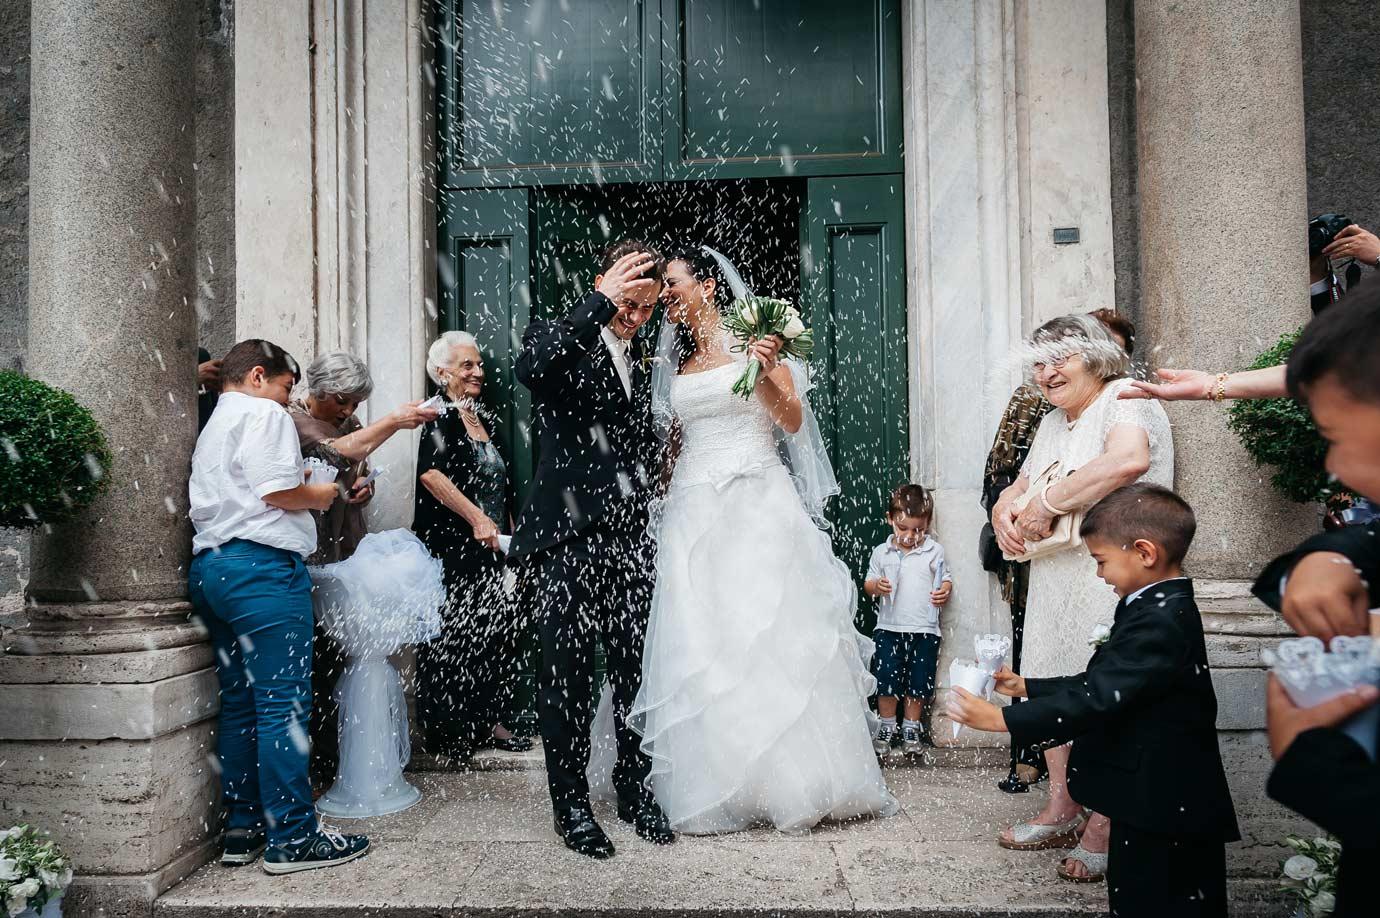 Matrimonio-Fotografo-Reportage-Roma-Cerimonia